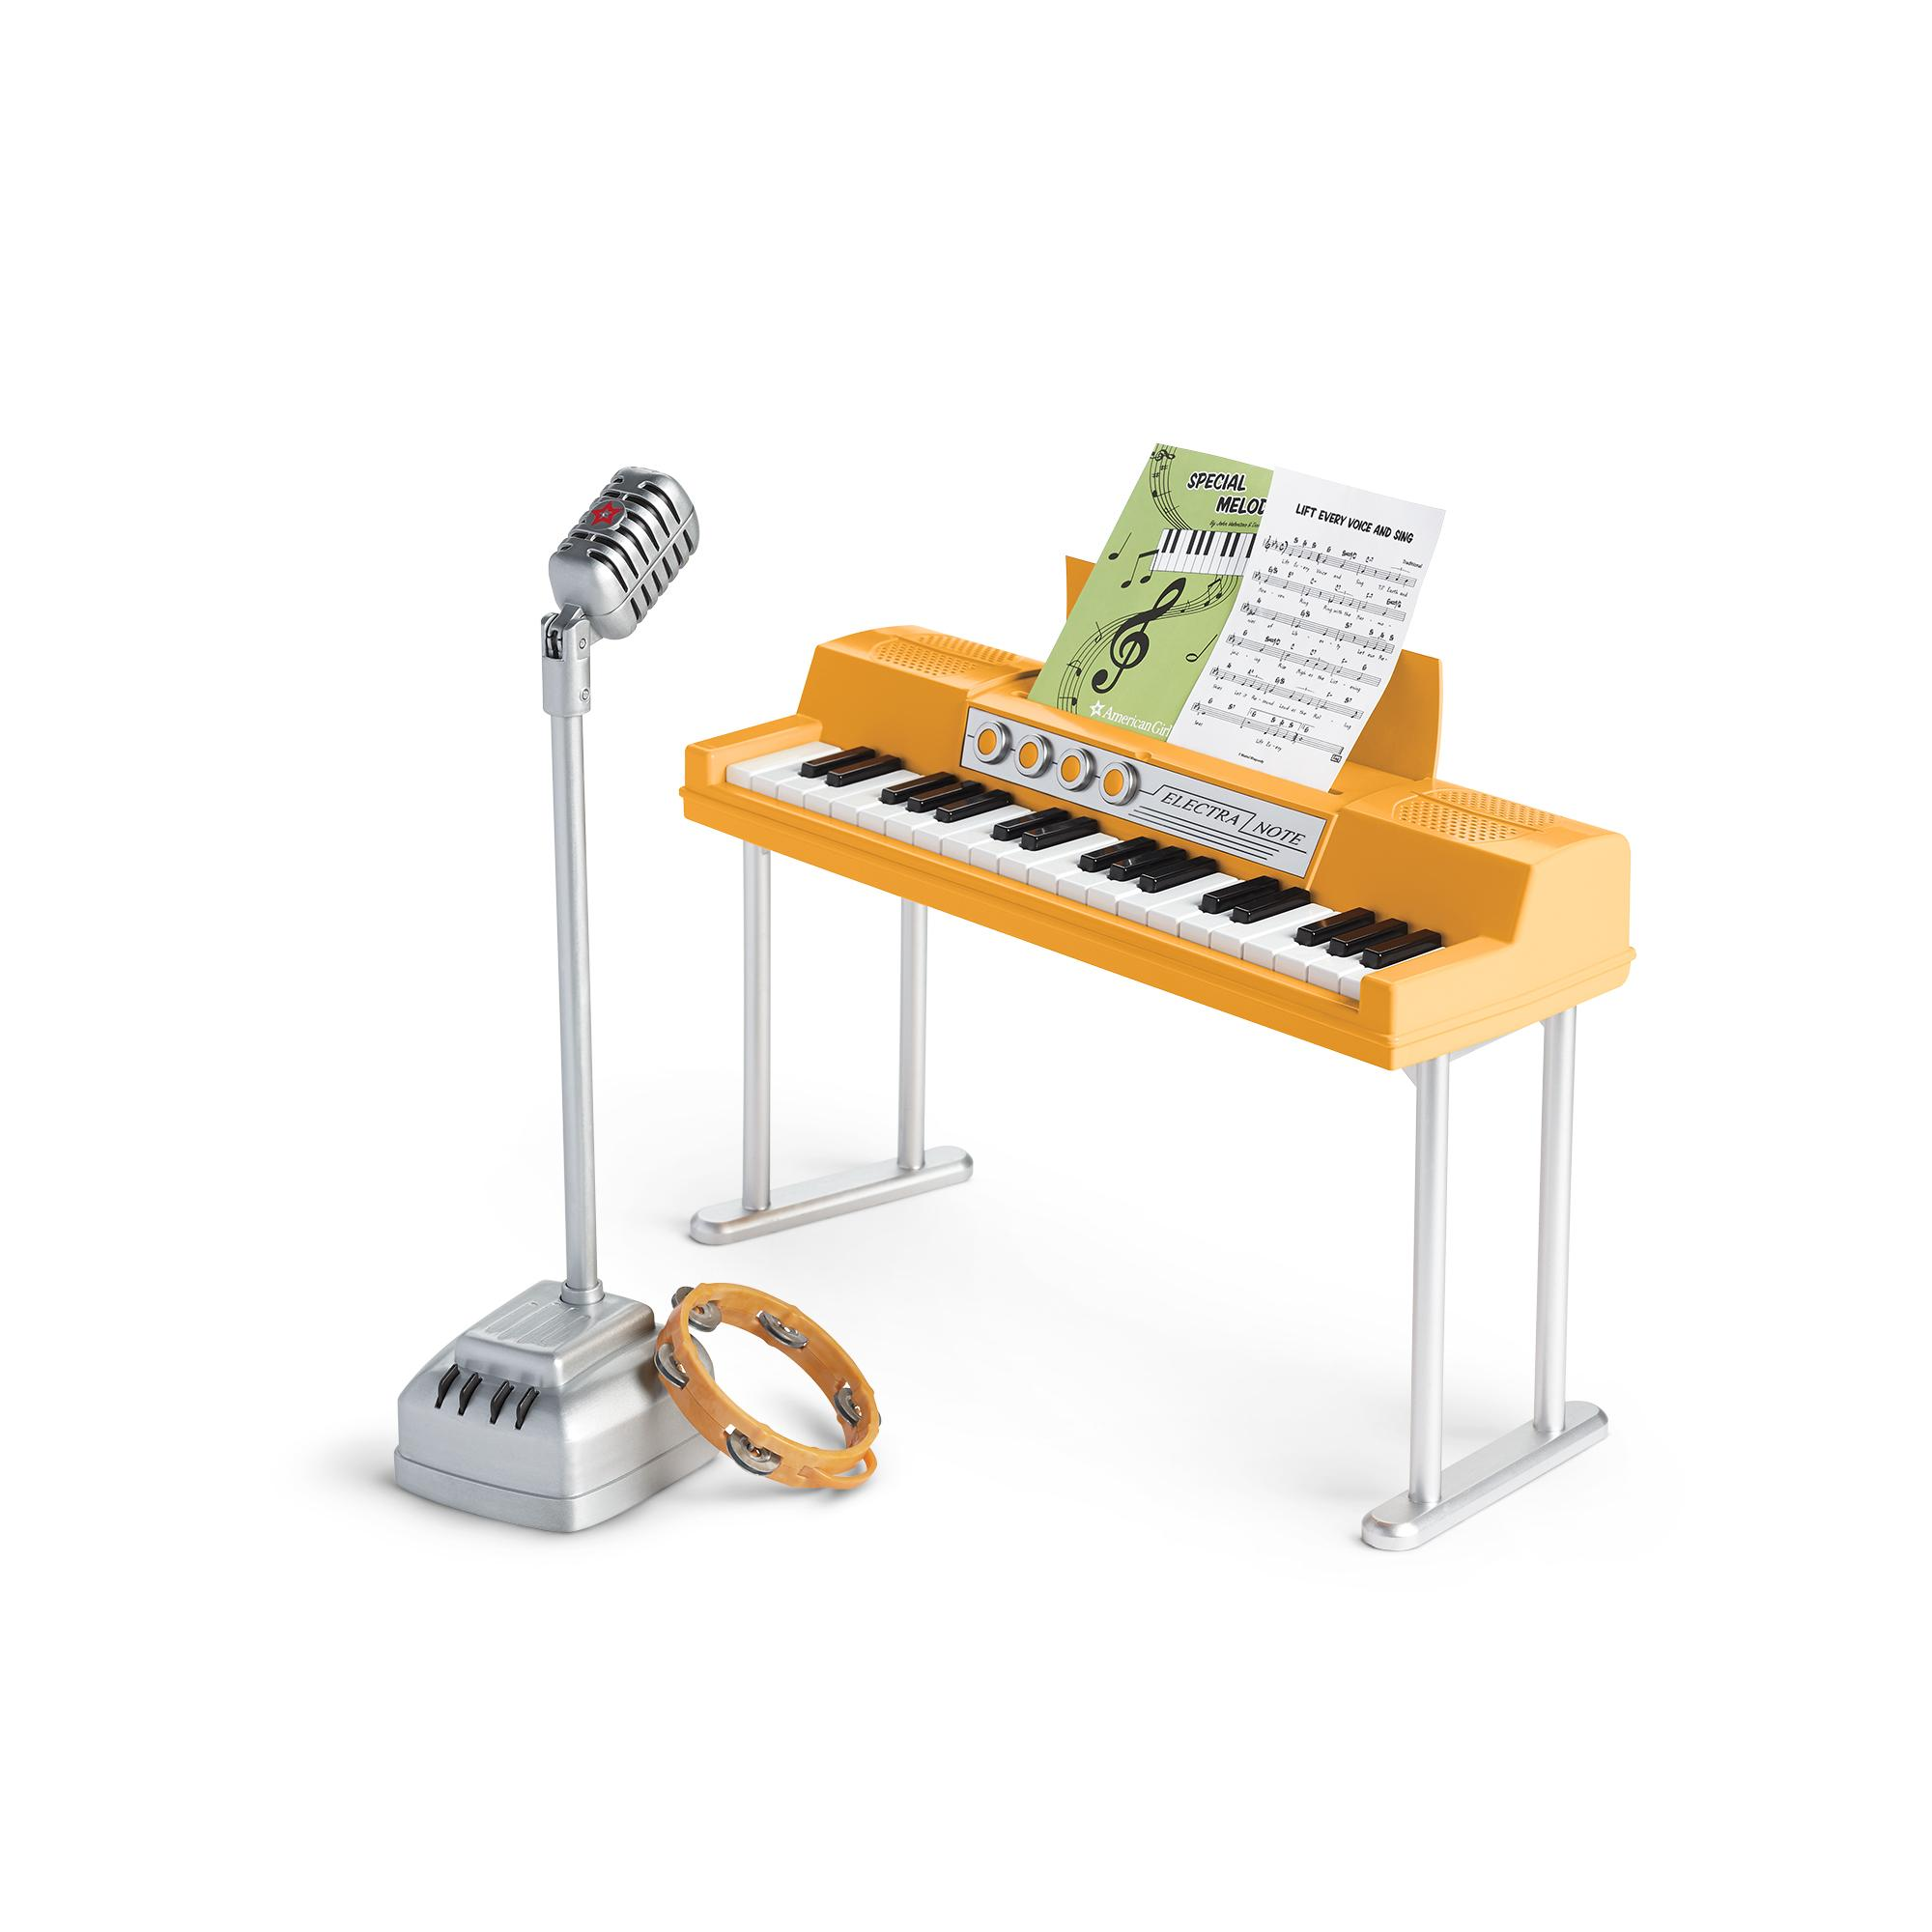 Amazon.com: American Girl Melody Recording Studio Collection: Toys